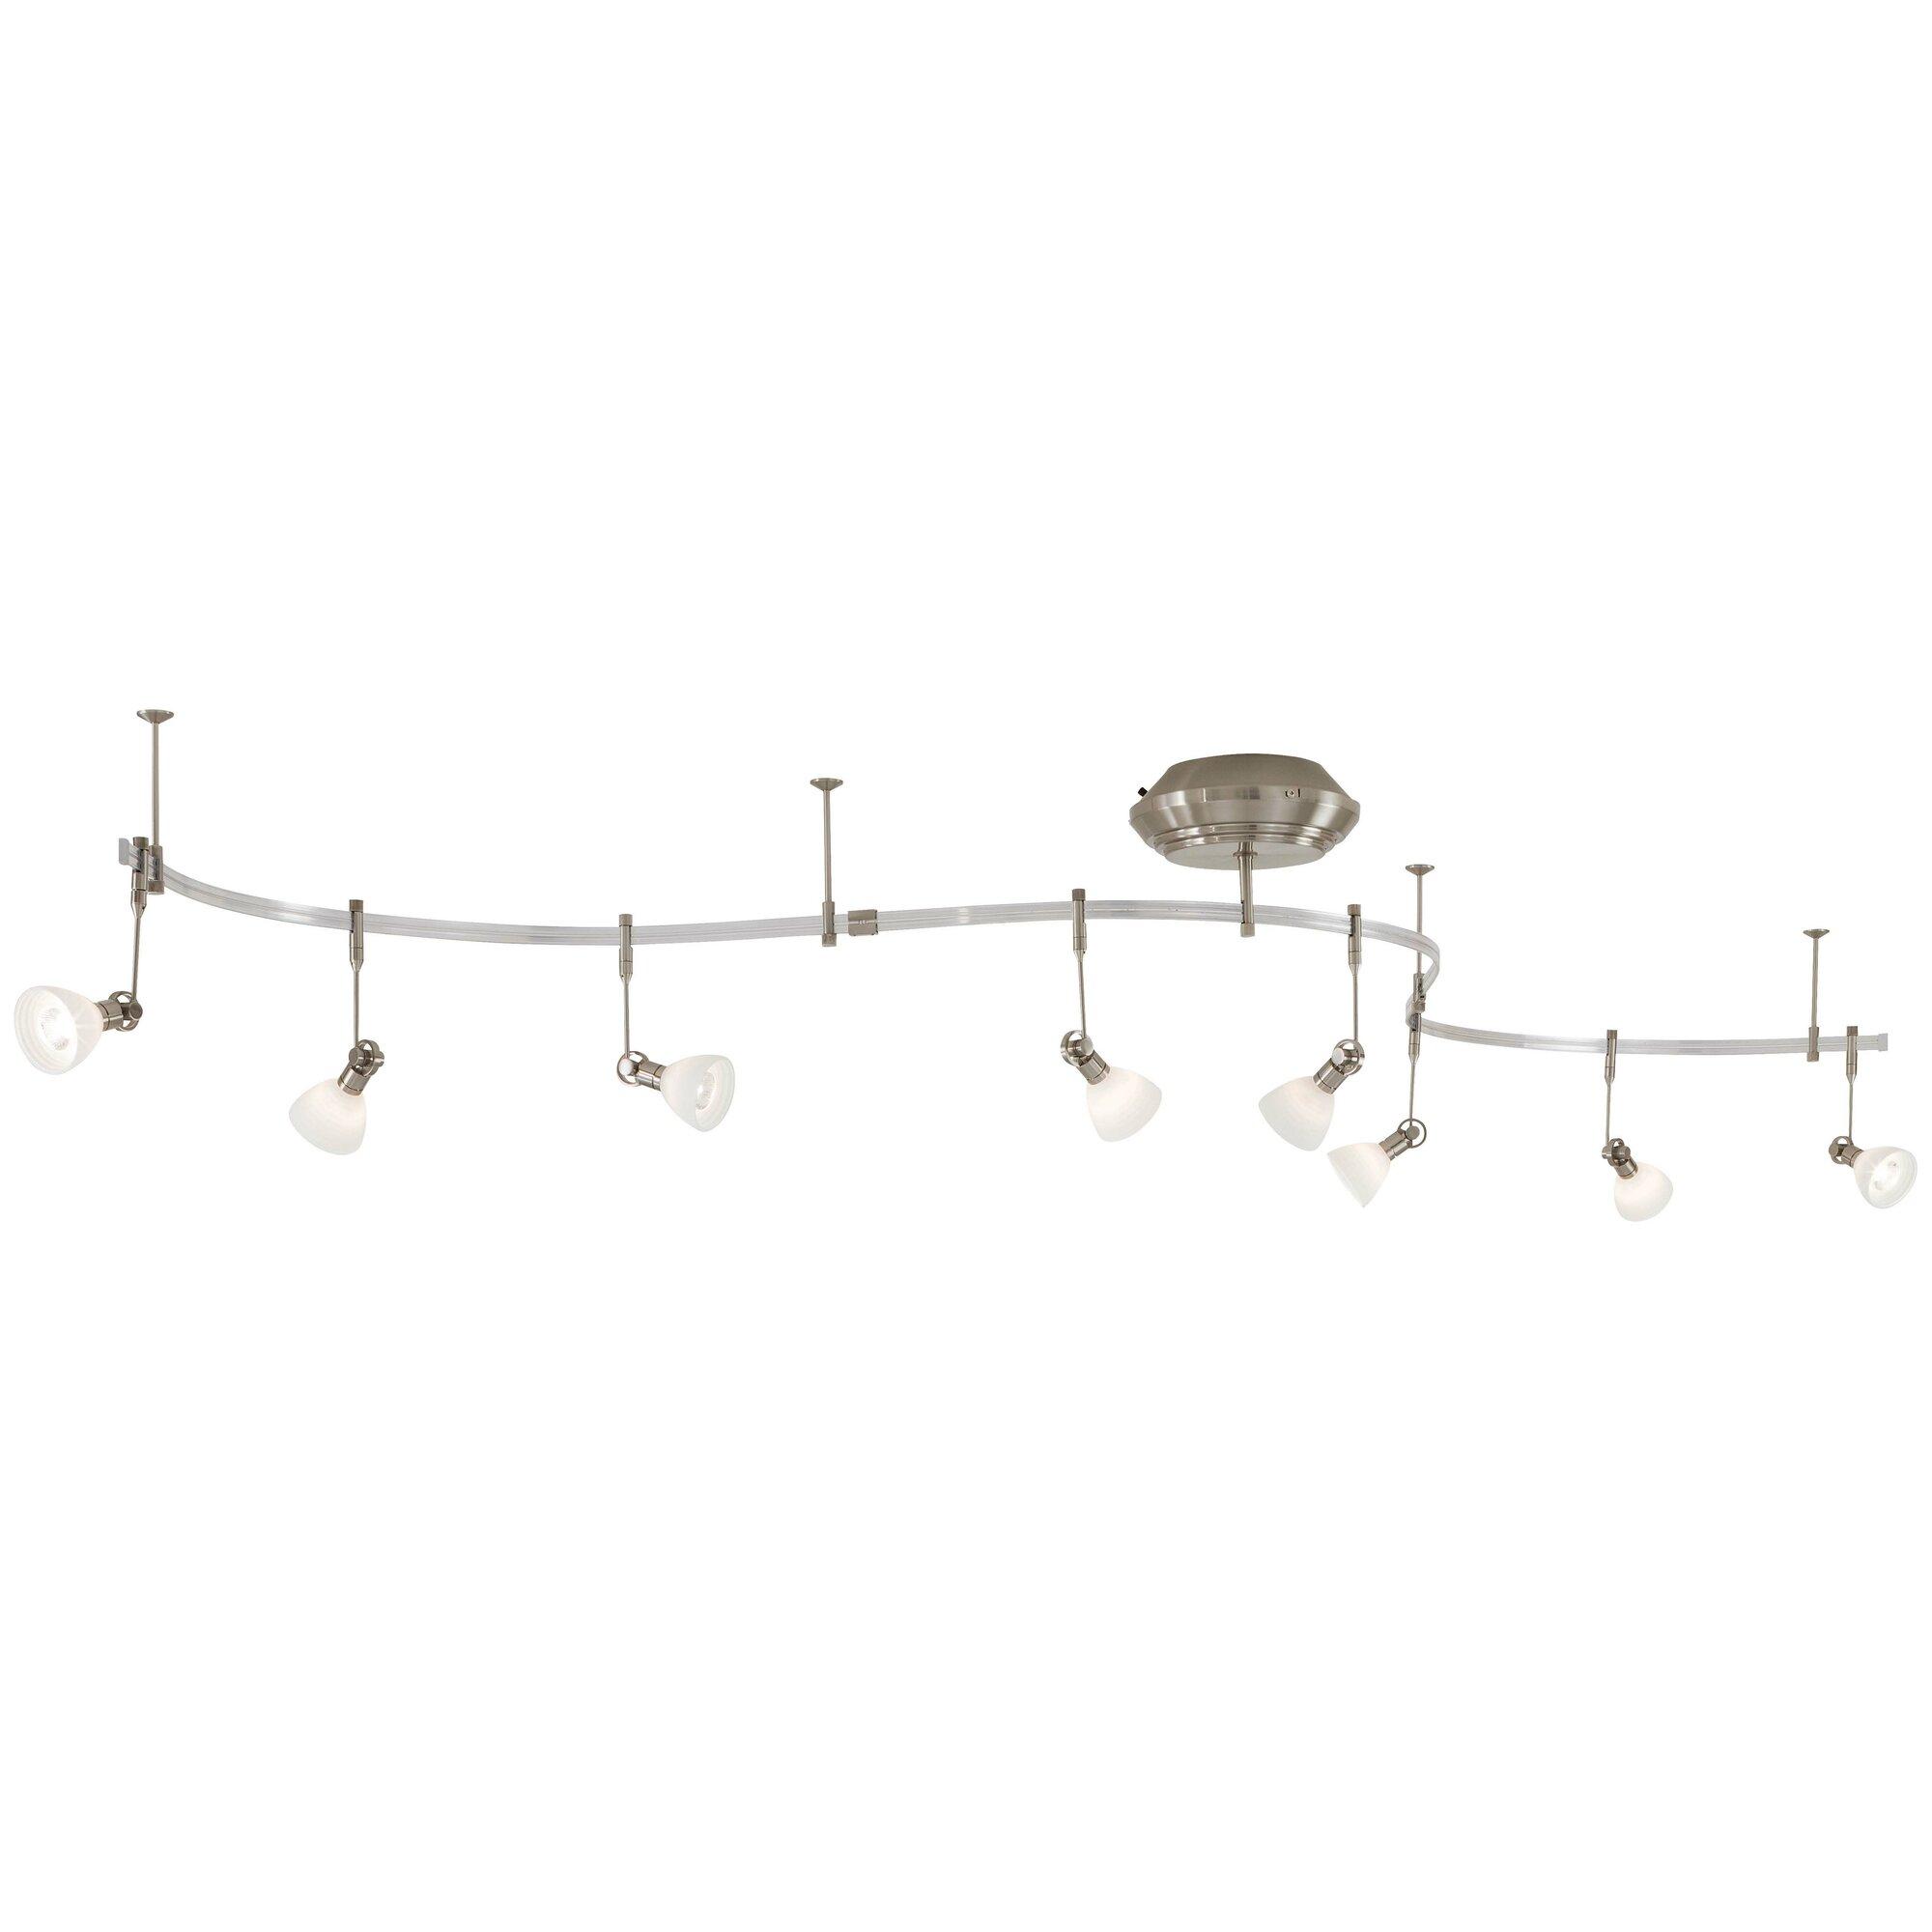 George Kovacs By Minka Lightrail 8 Full Track Lighting Kit EBay